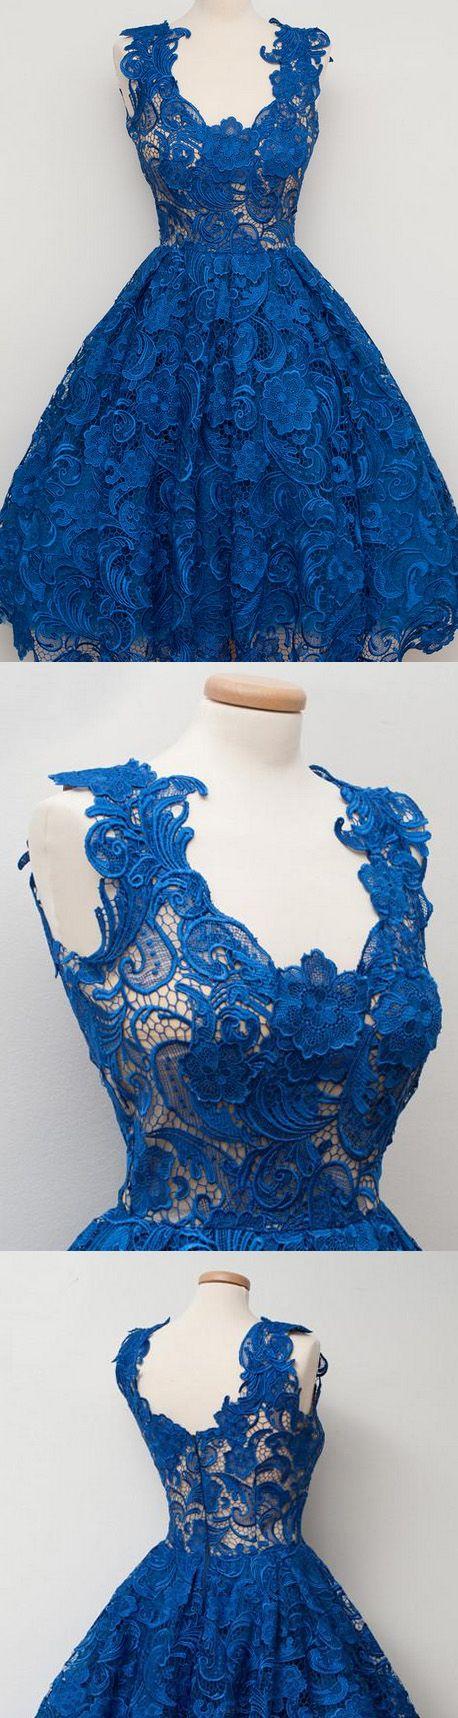 Hermoso vestido azul elegante